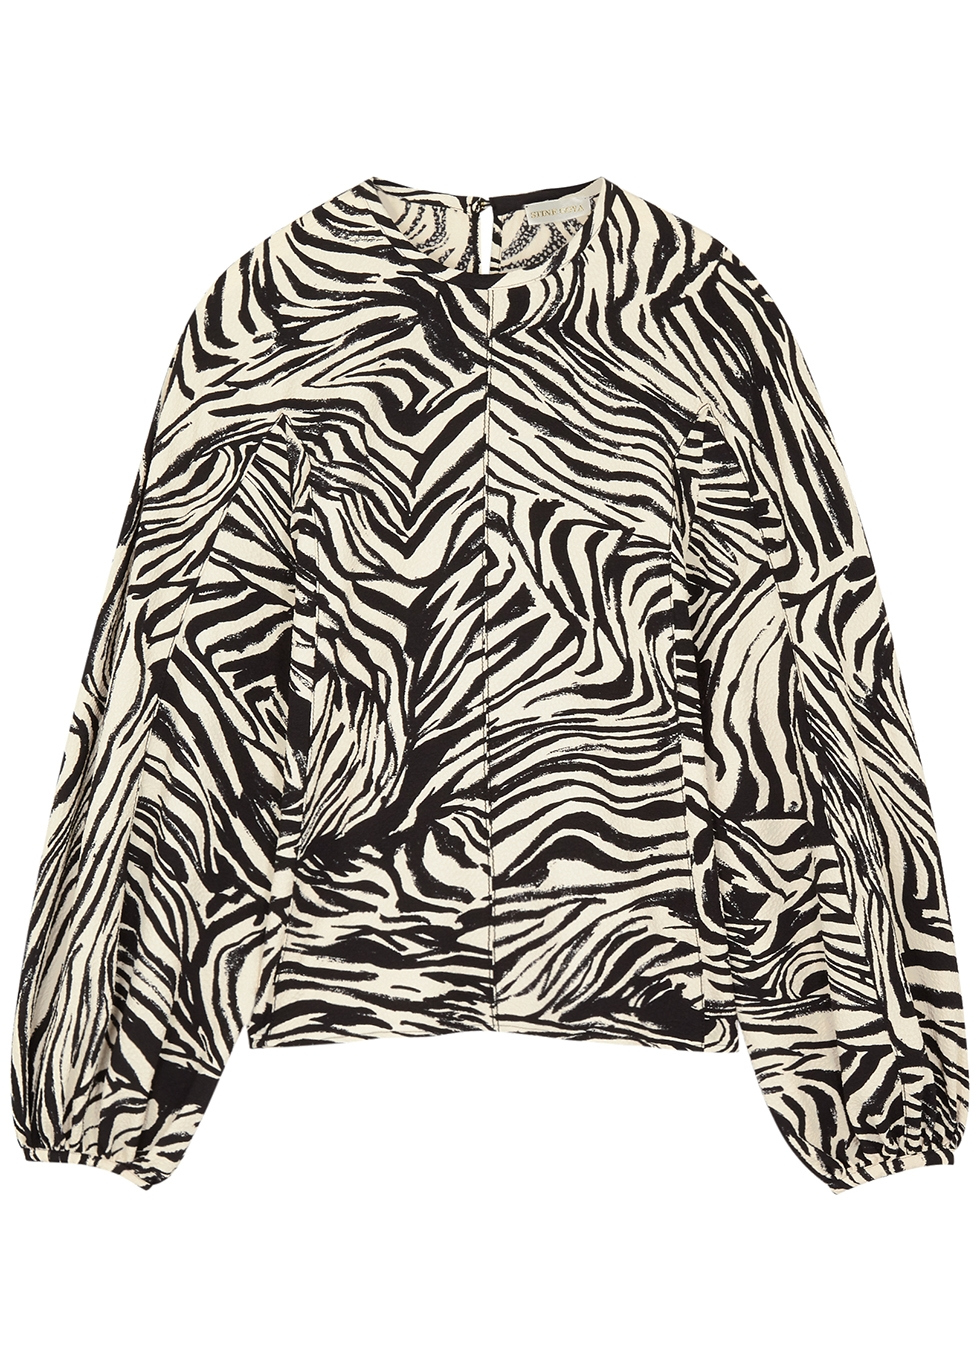 Dianne zebra-print top